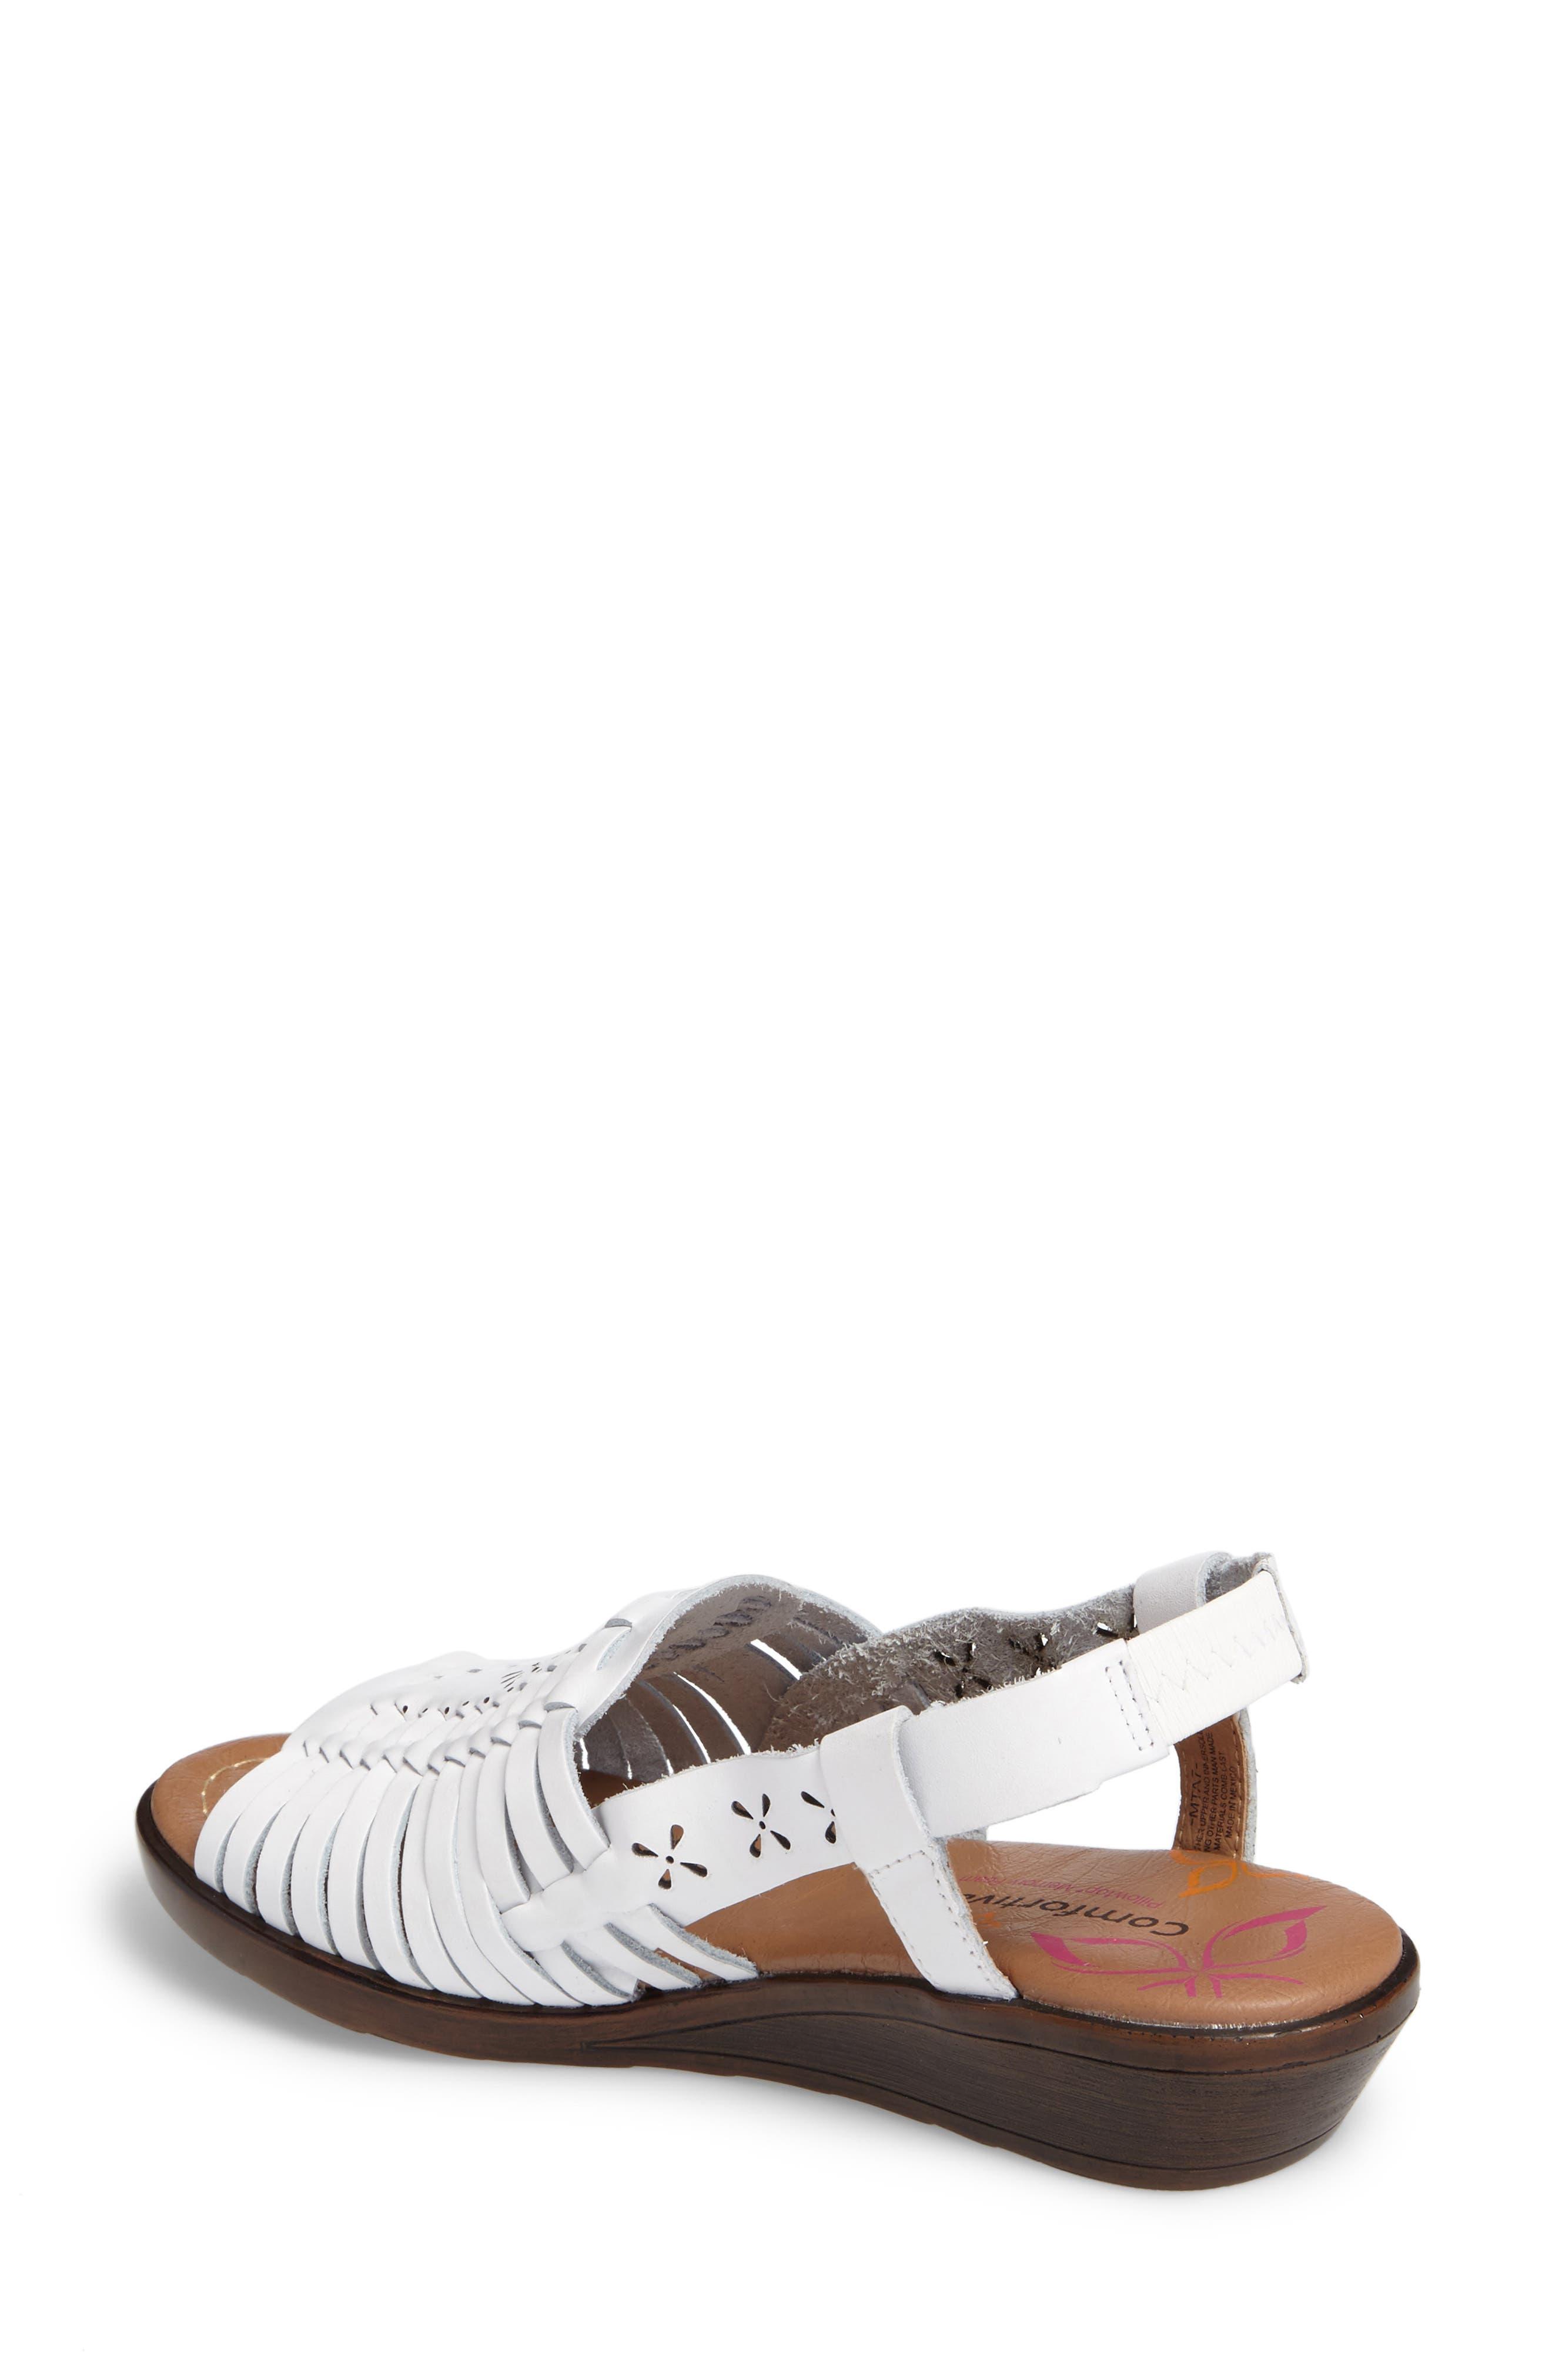 Formasa Huarache Slingback Sandal,                             Alternate thumbnail 2, color,                             100